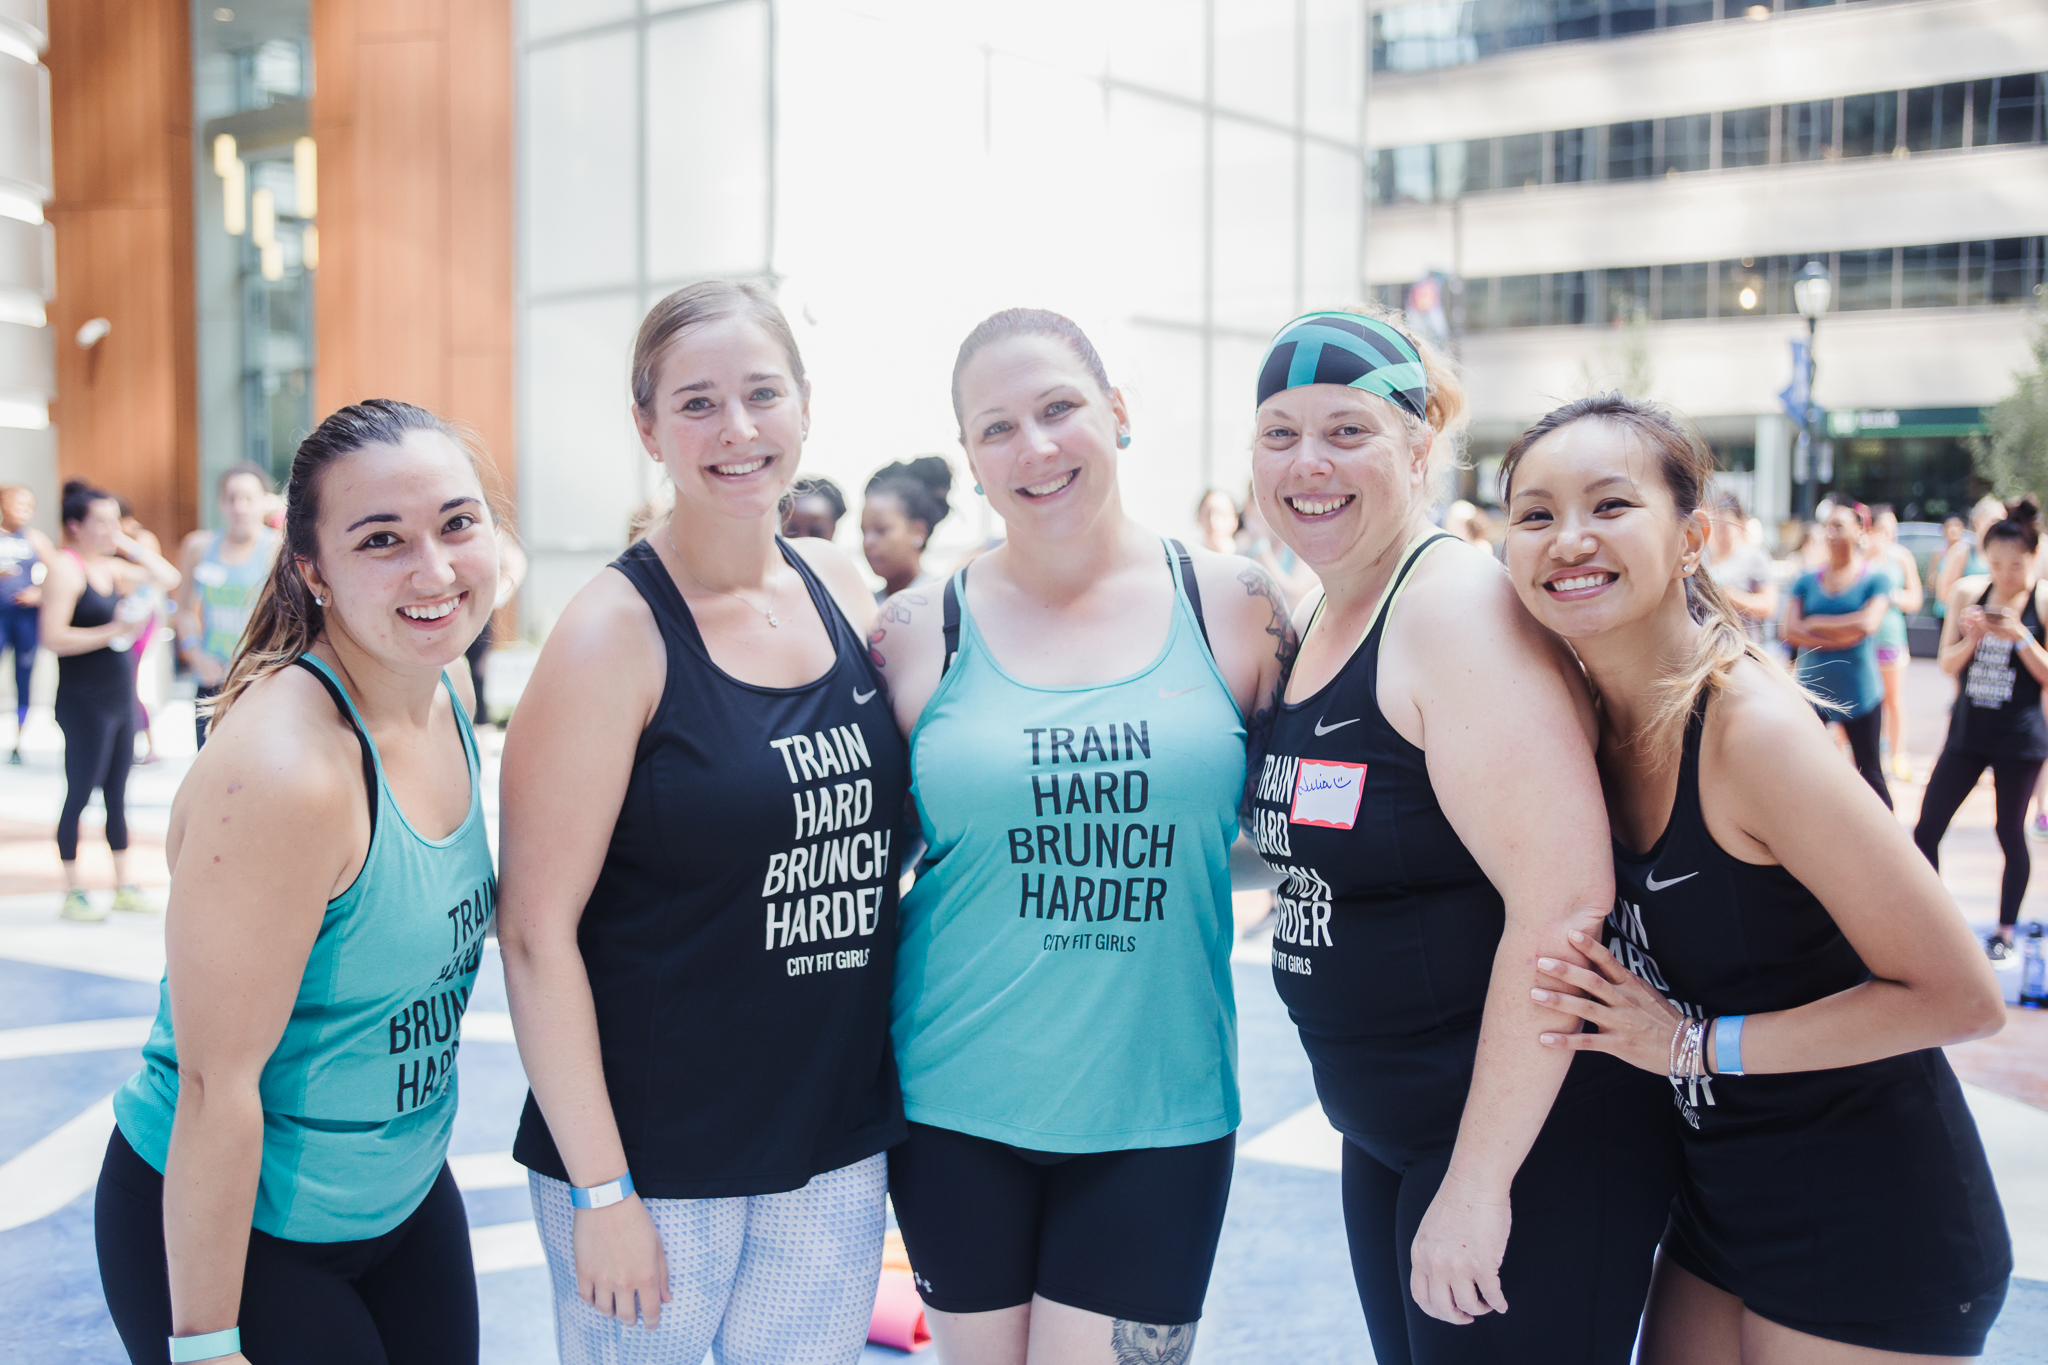 CityFitGirls Fit Retreat 2017-162.jpg